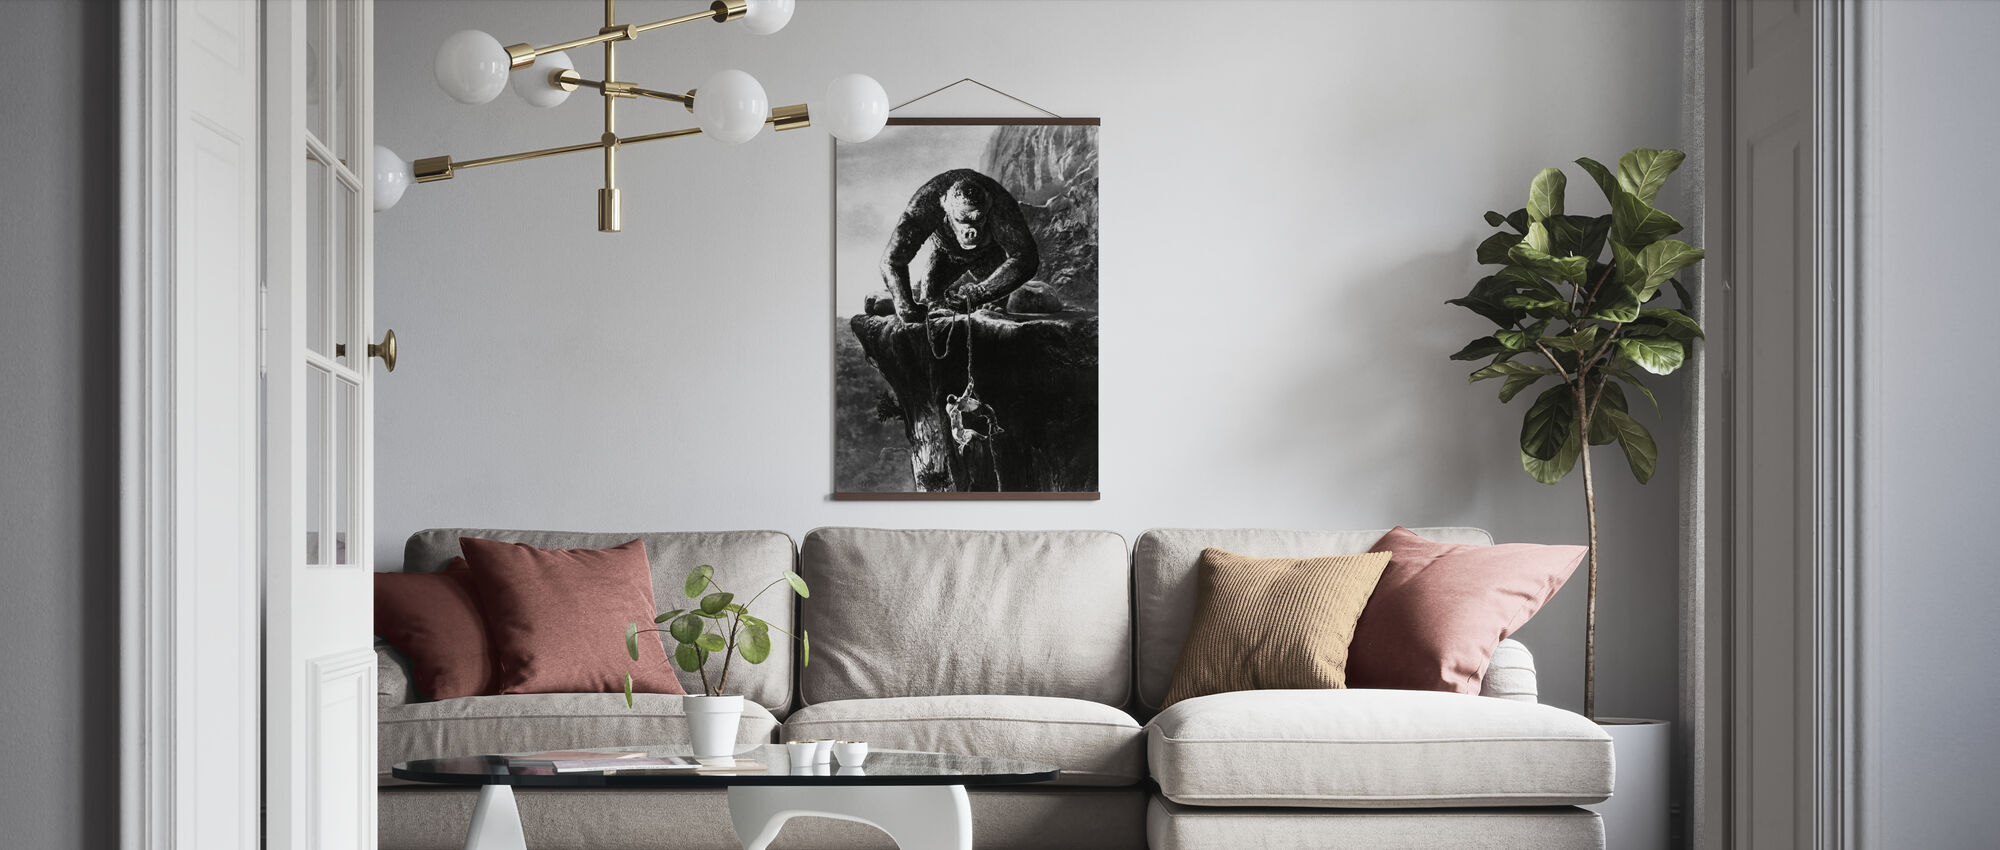 King Kong - Fay Wray - Poster - Vardagsrum